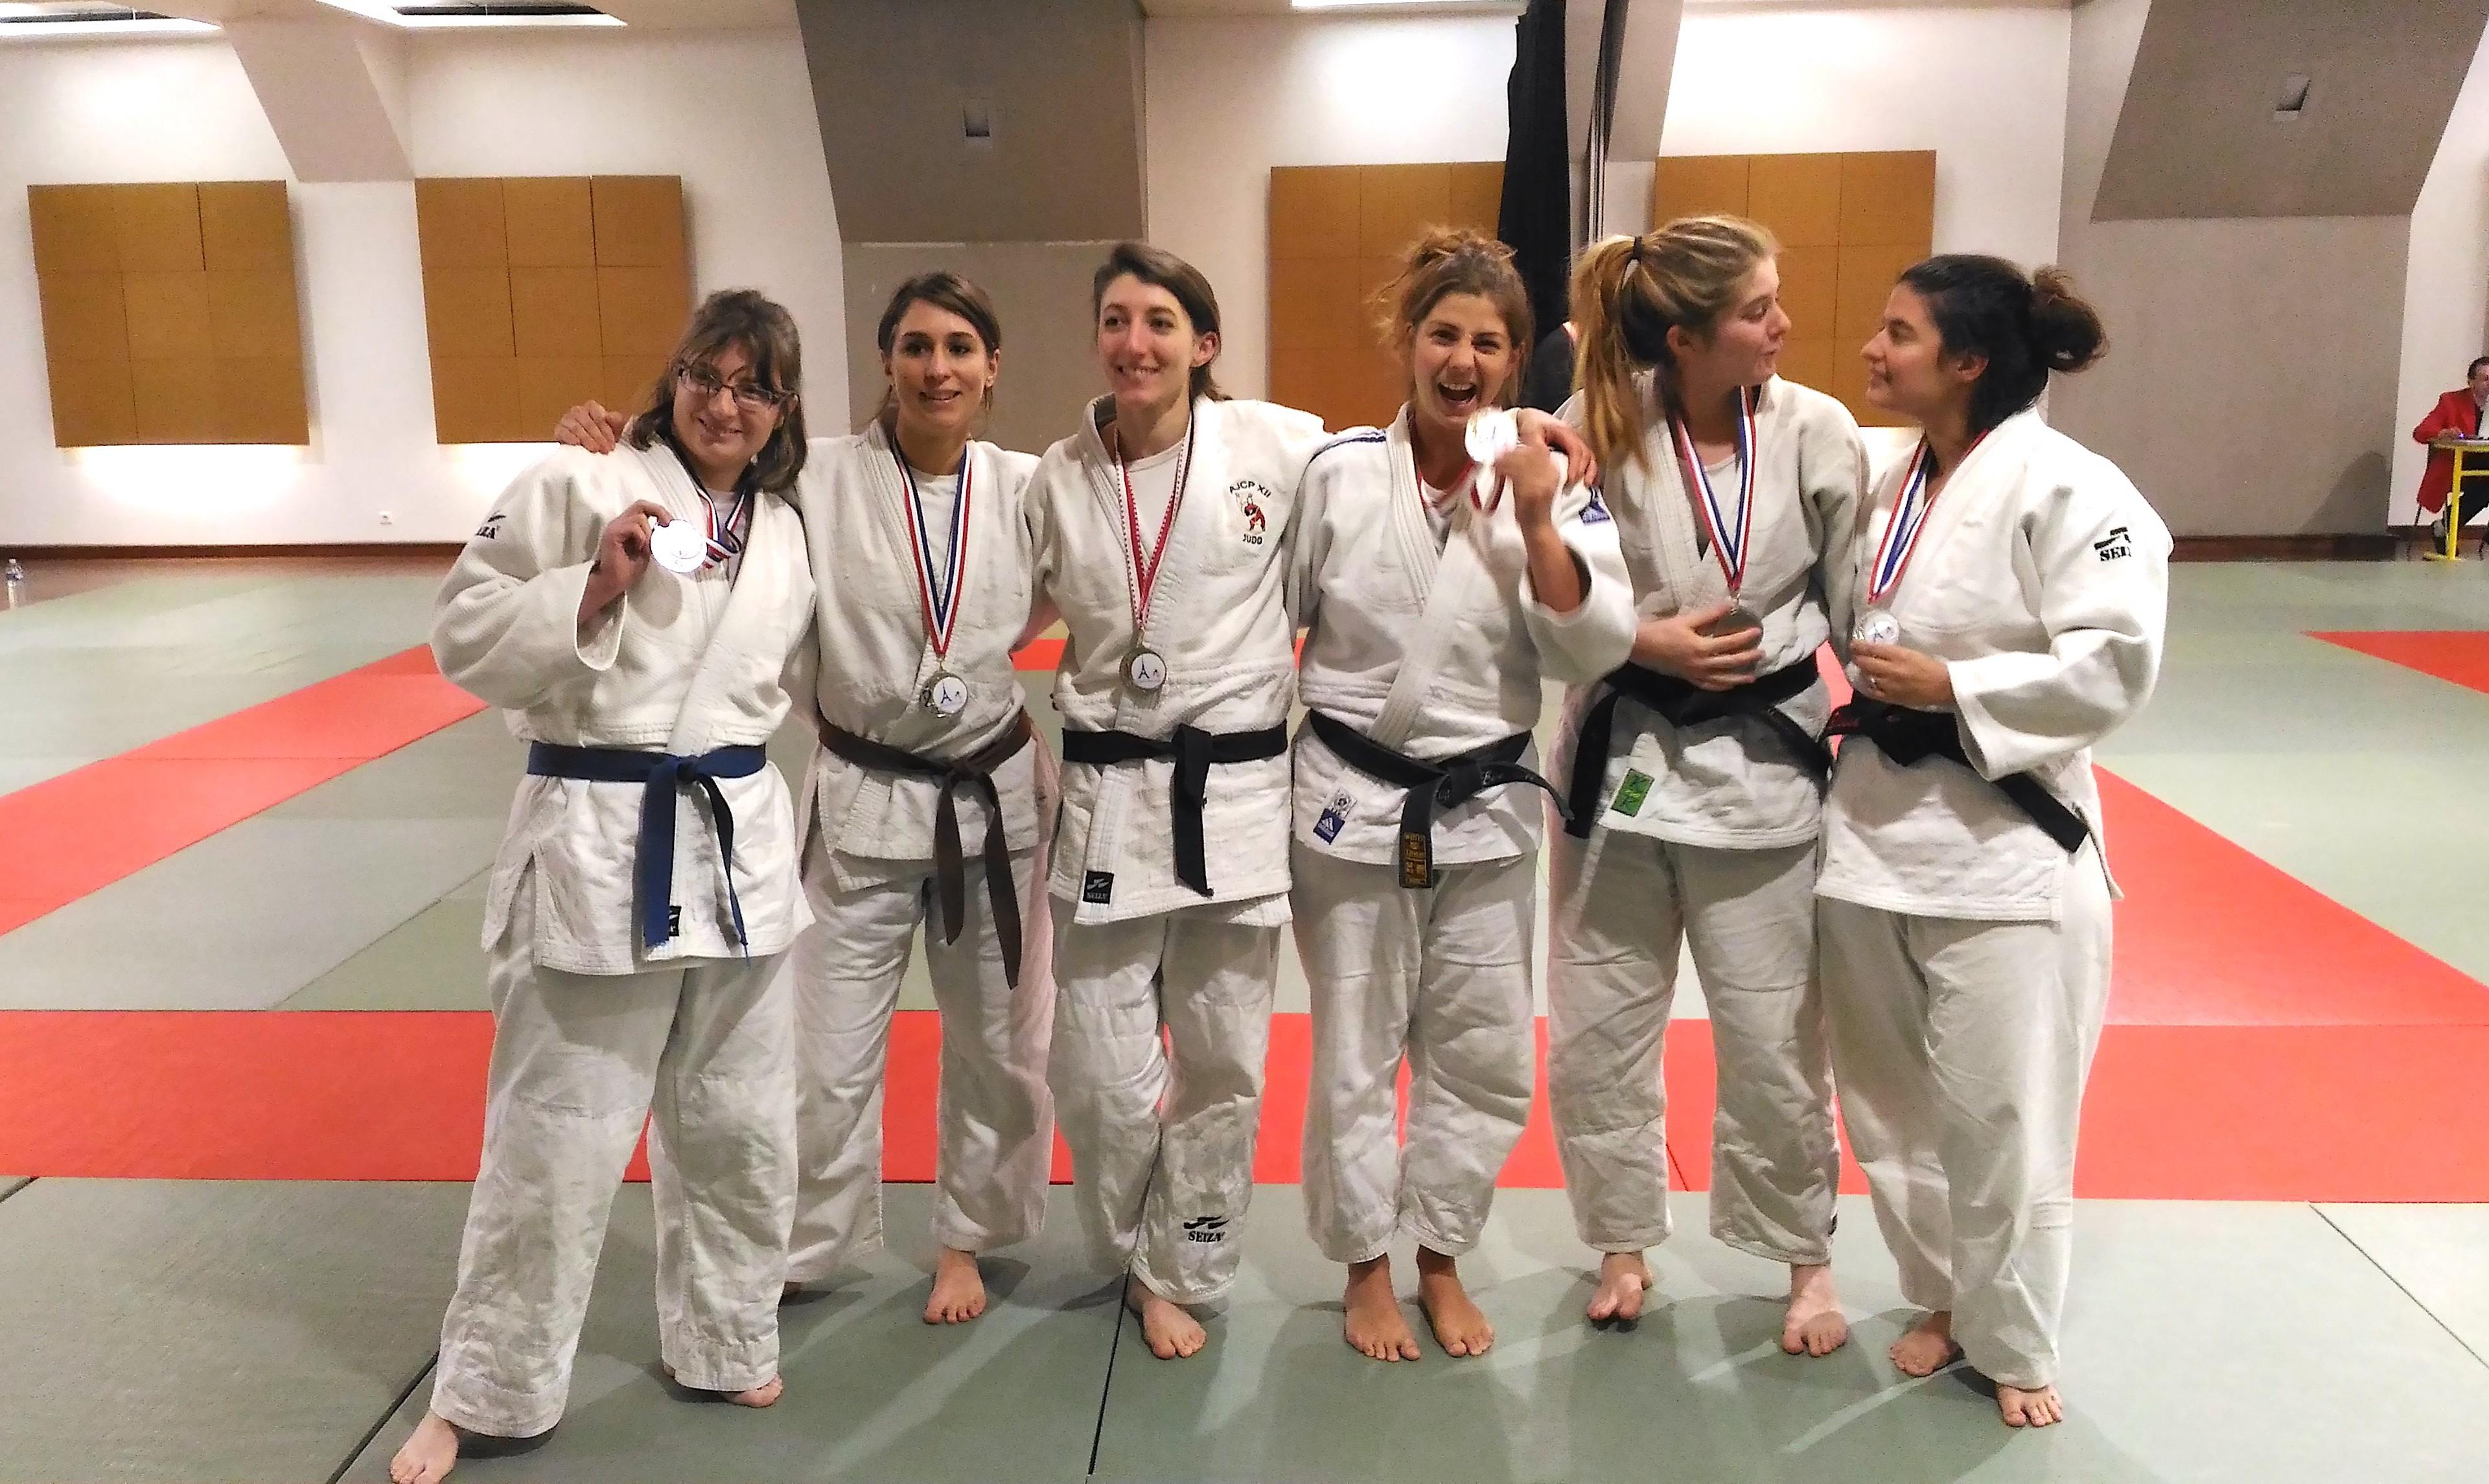 Challenge Yoshino et Trophée Sakura mercredi 6 décembre 2017